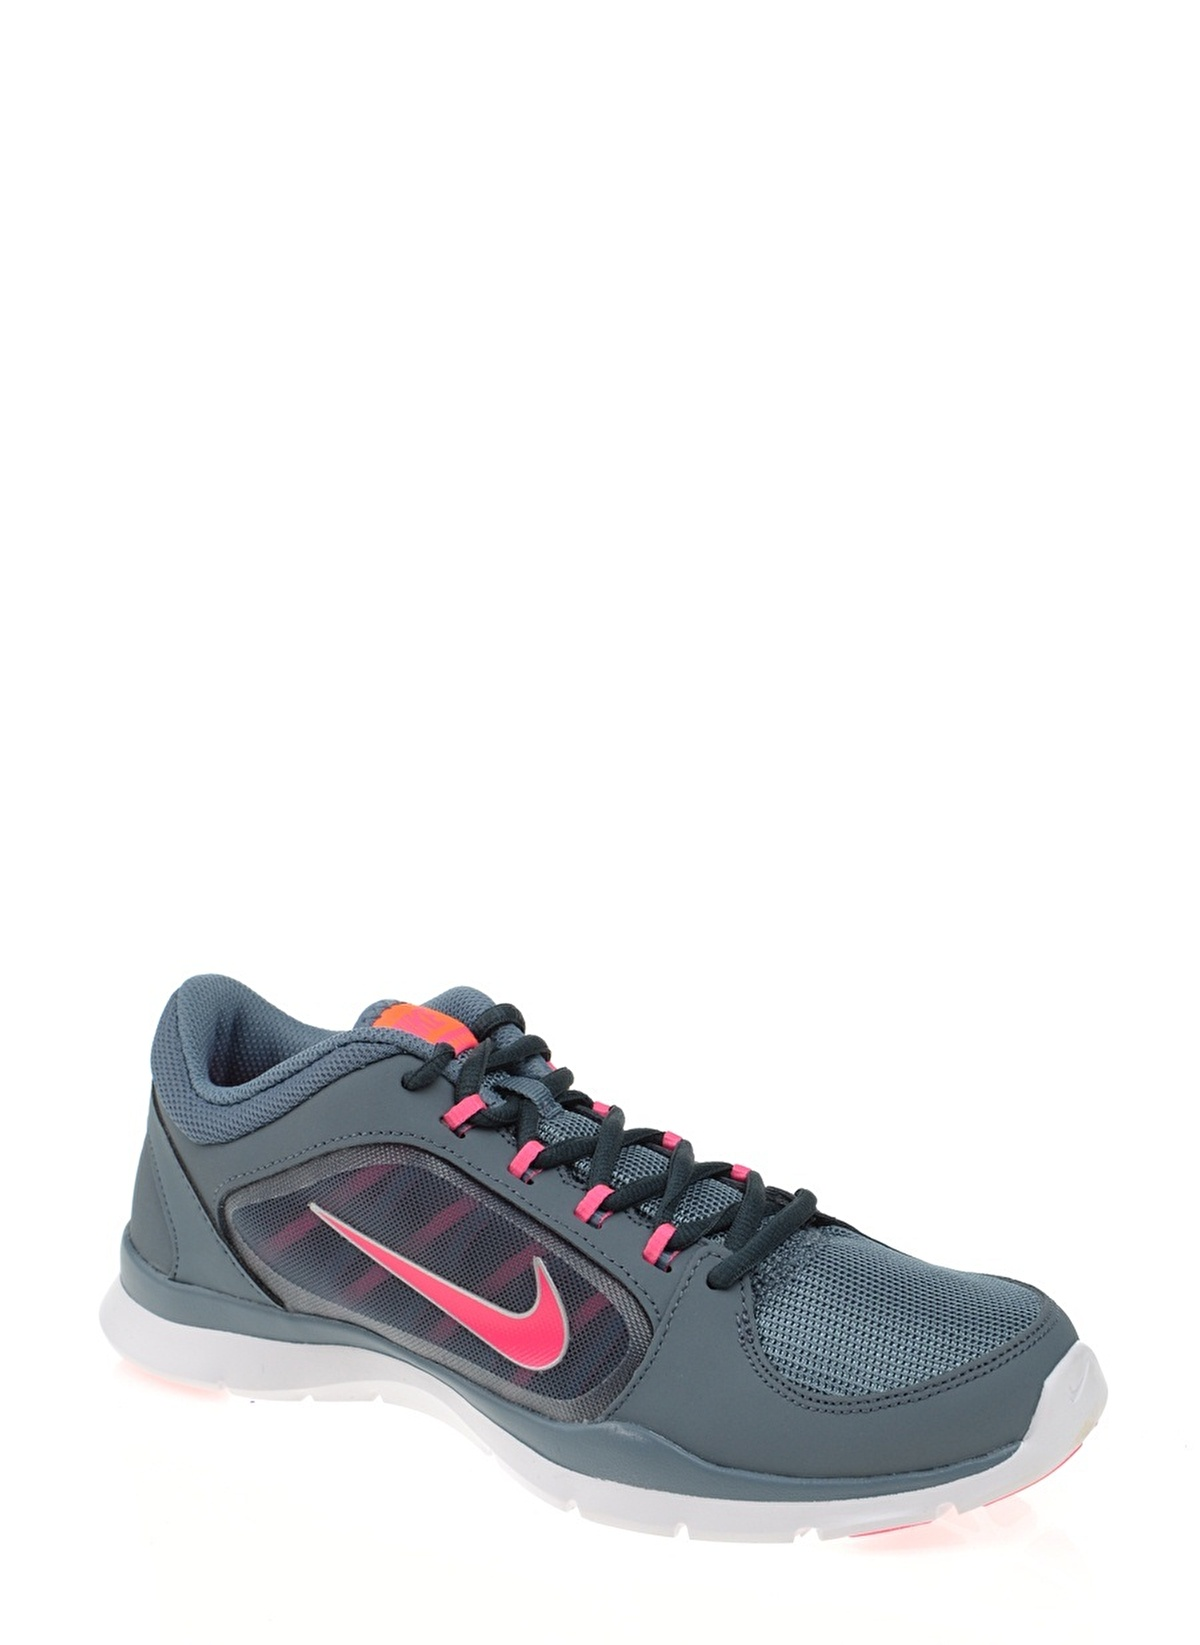 0d85fea3b4ad6 Nike Kadın Wmns Nike Flex Trainer 4 Bl Grpht Pnk Pw-Clssc Chrcl-Tt ...